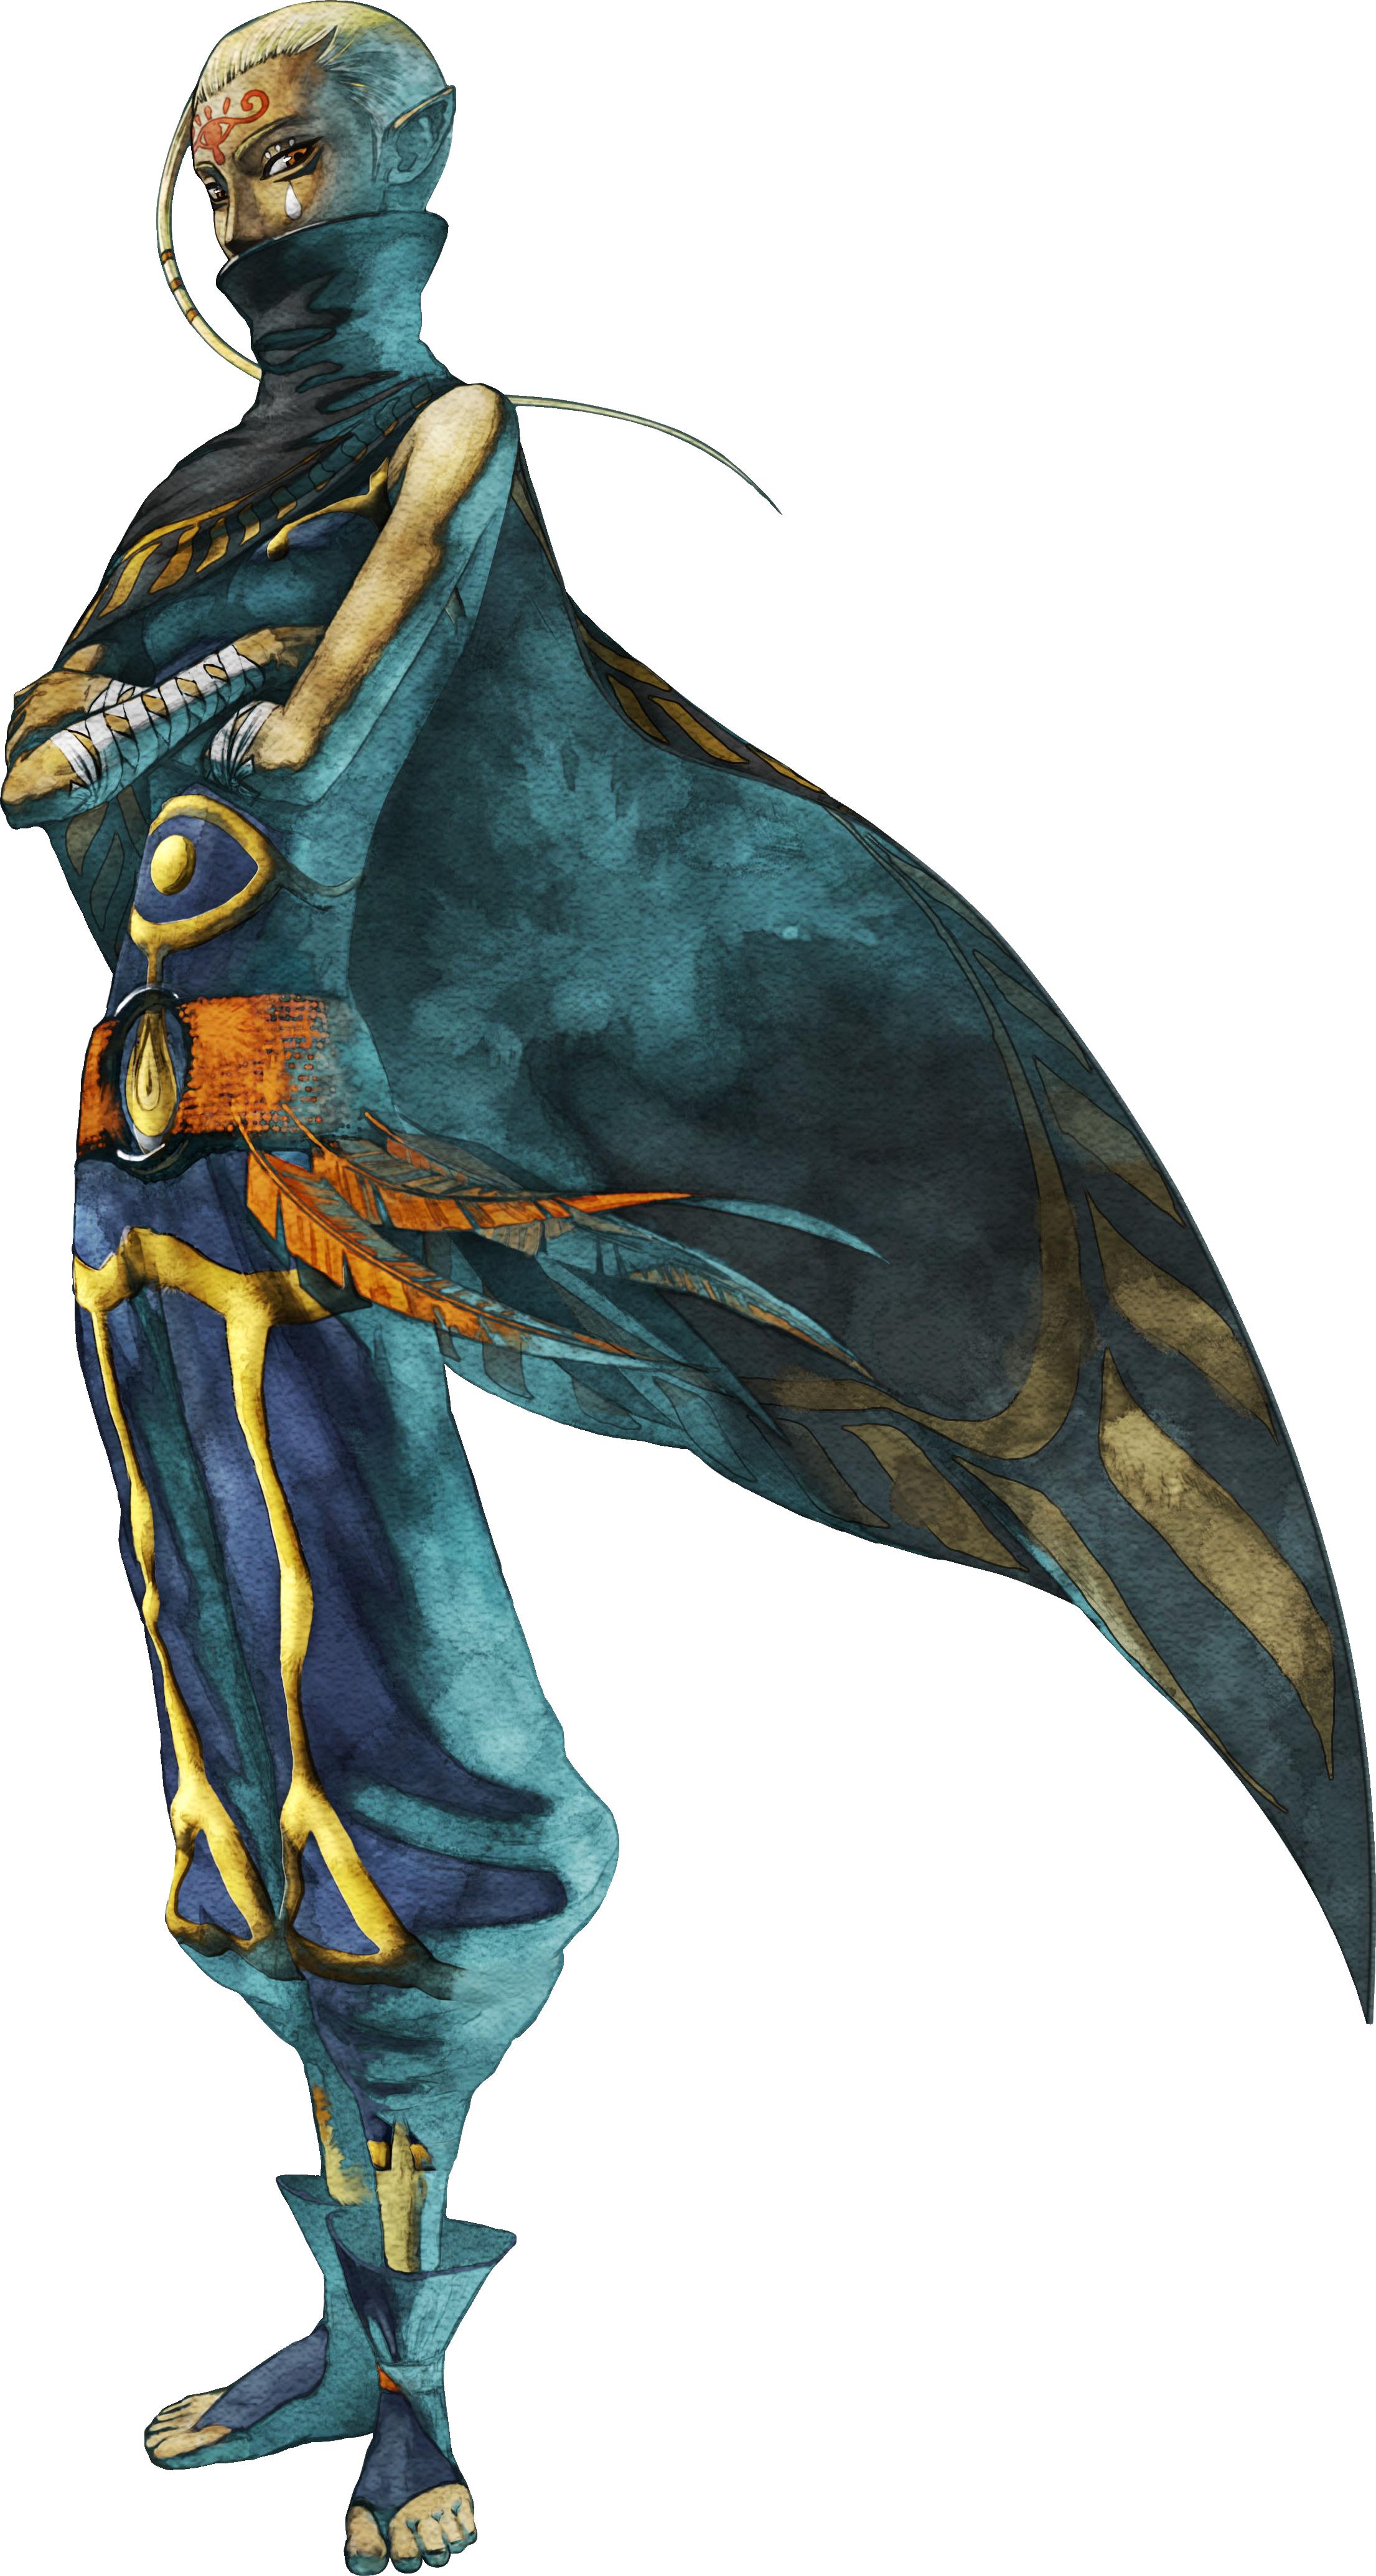 Impa_Artwork_(Skyward_Sword).png